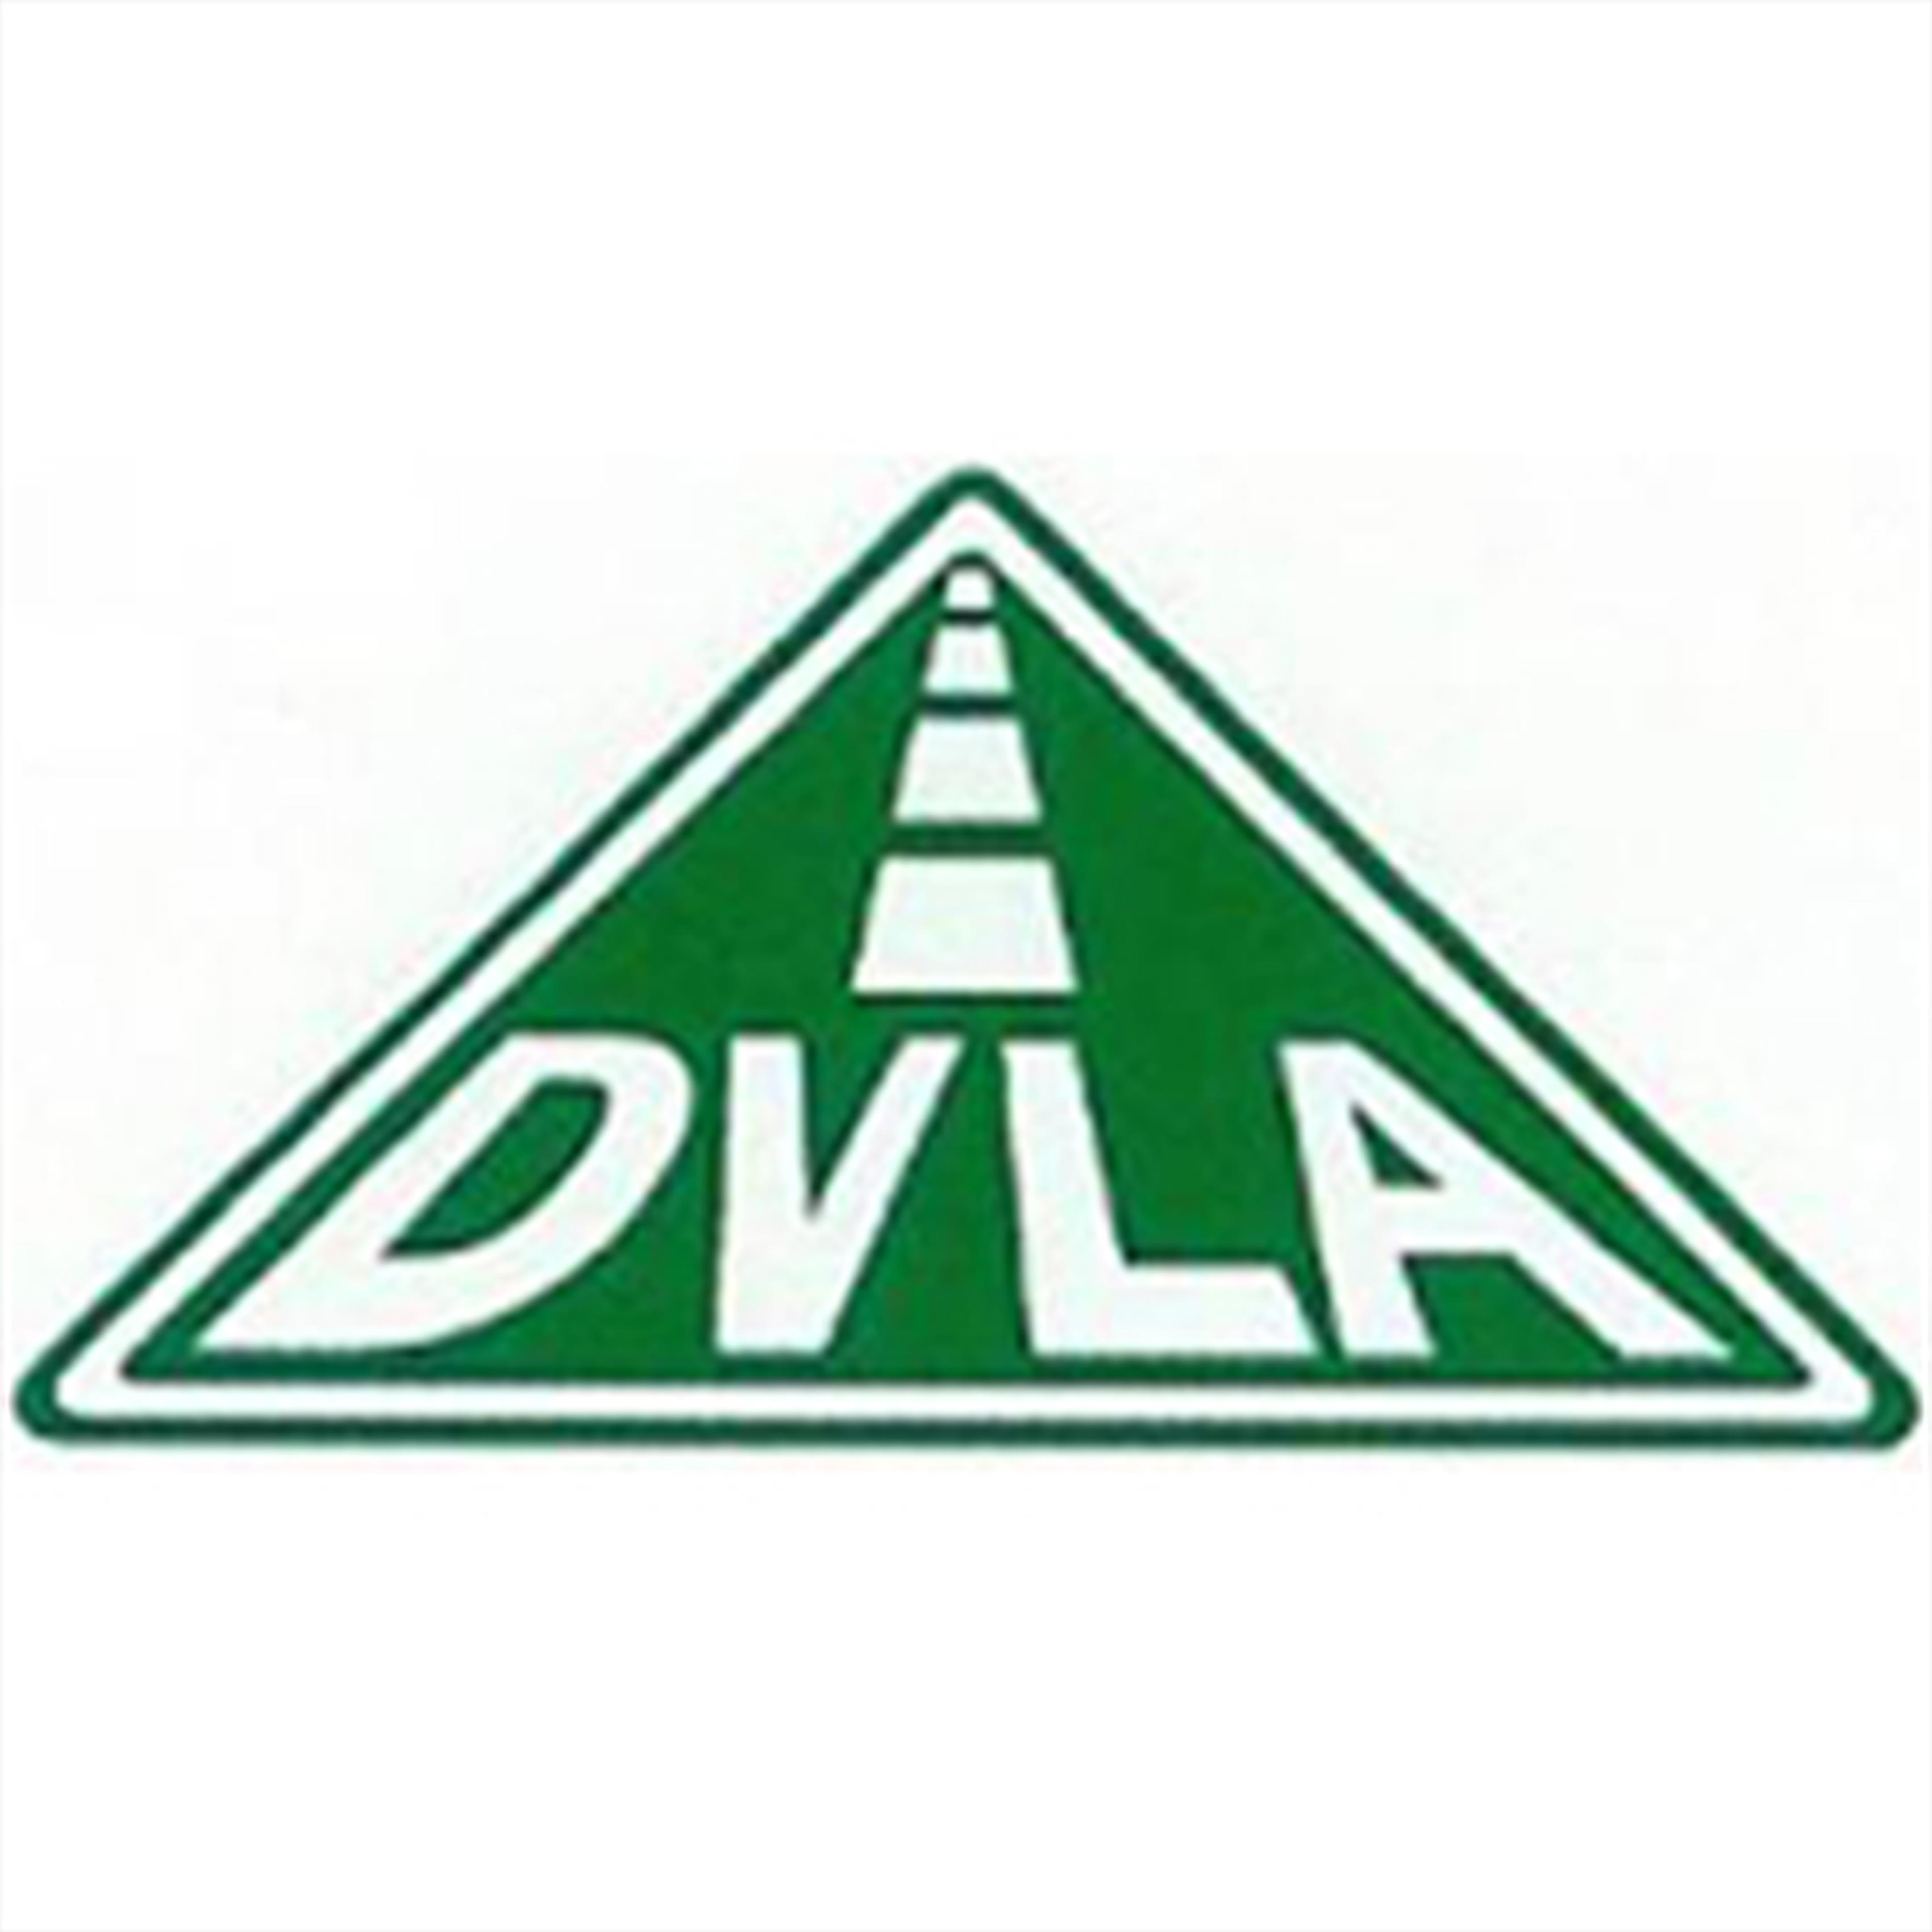 Dvla Car Tax Refud